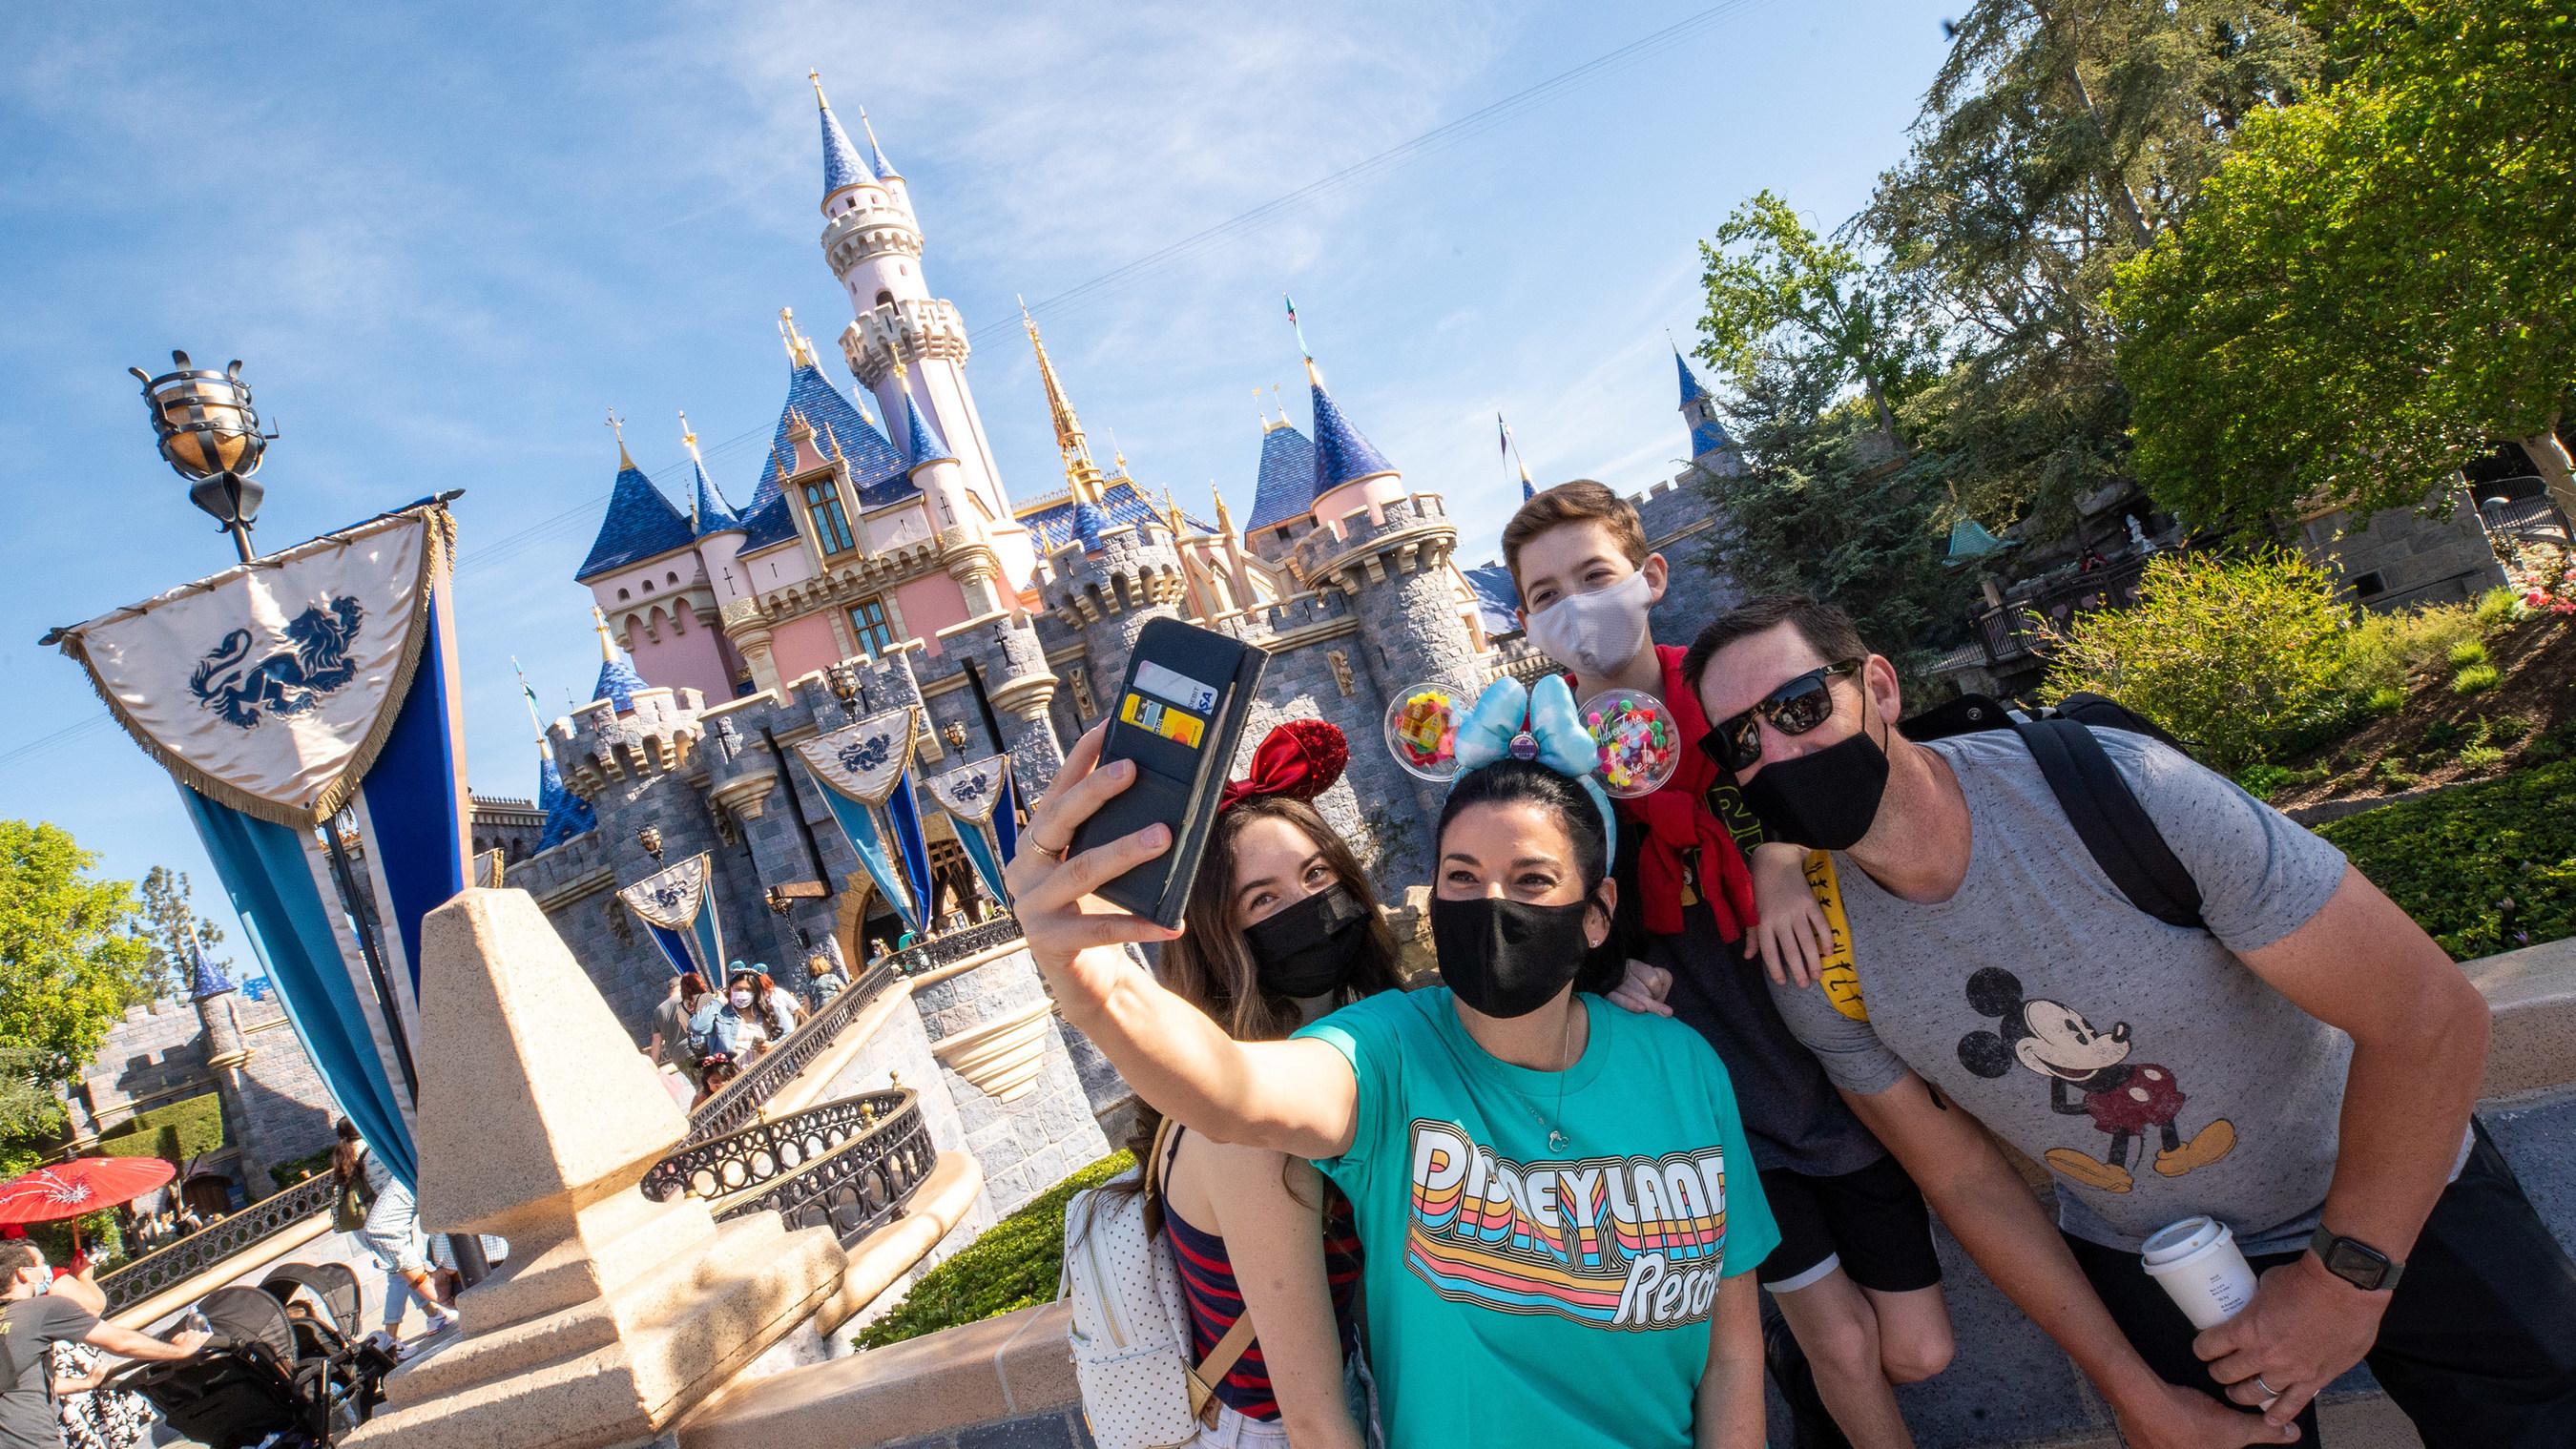 Group taking a selfie at Disneyland Resort